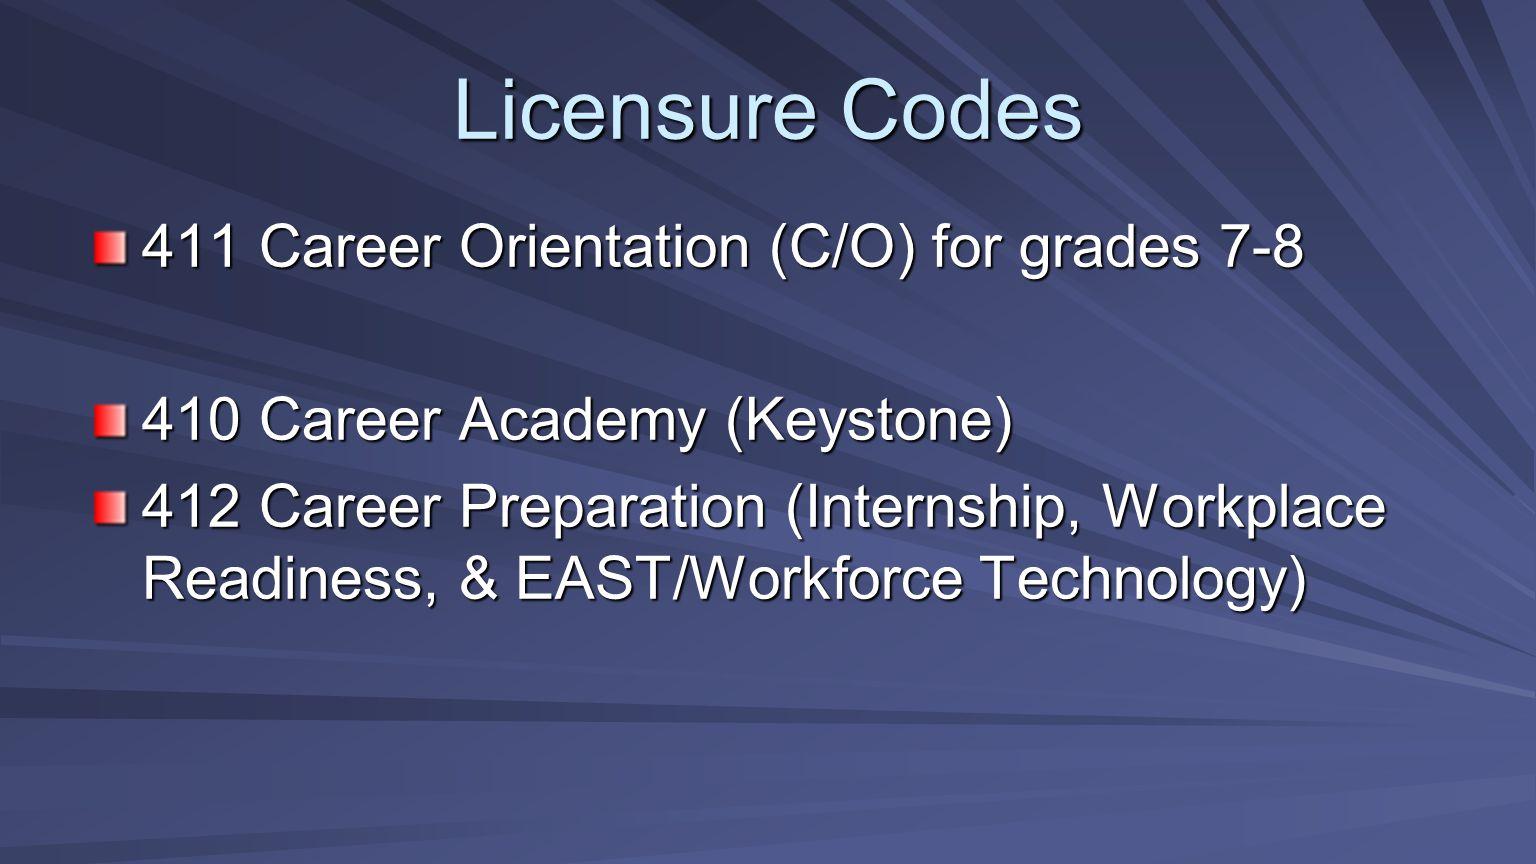 411 Career Orientation (C/O) for grades 7-8 410 Career Academy (Keystone) 412 Career Preparation (Internship, Workplace Readiness, & EAST/Workforce Te